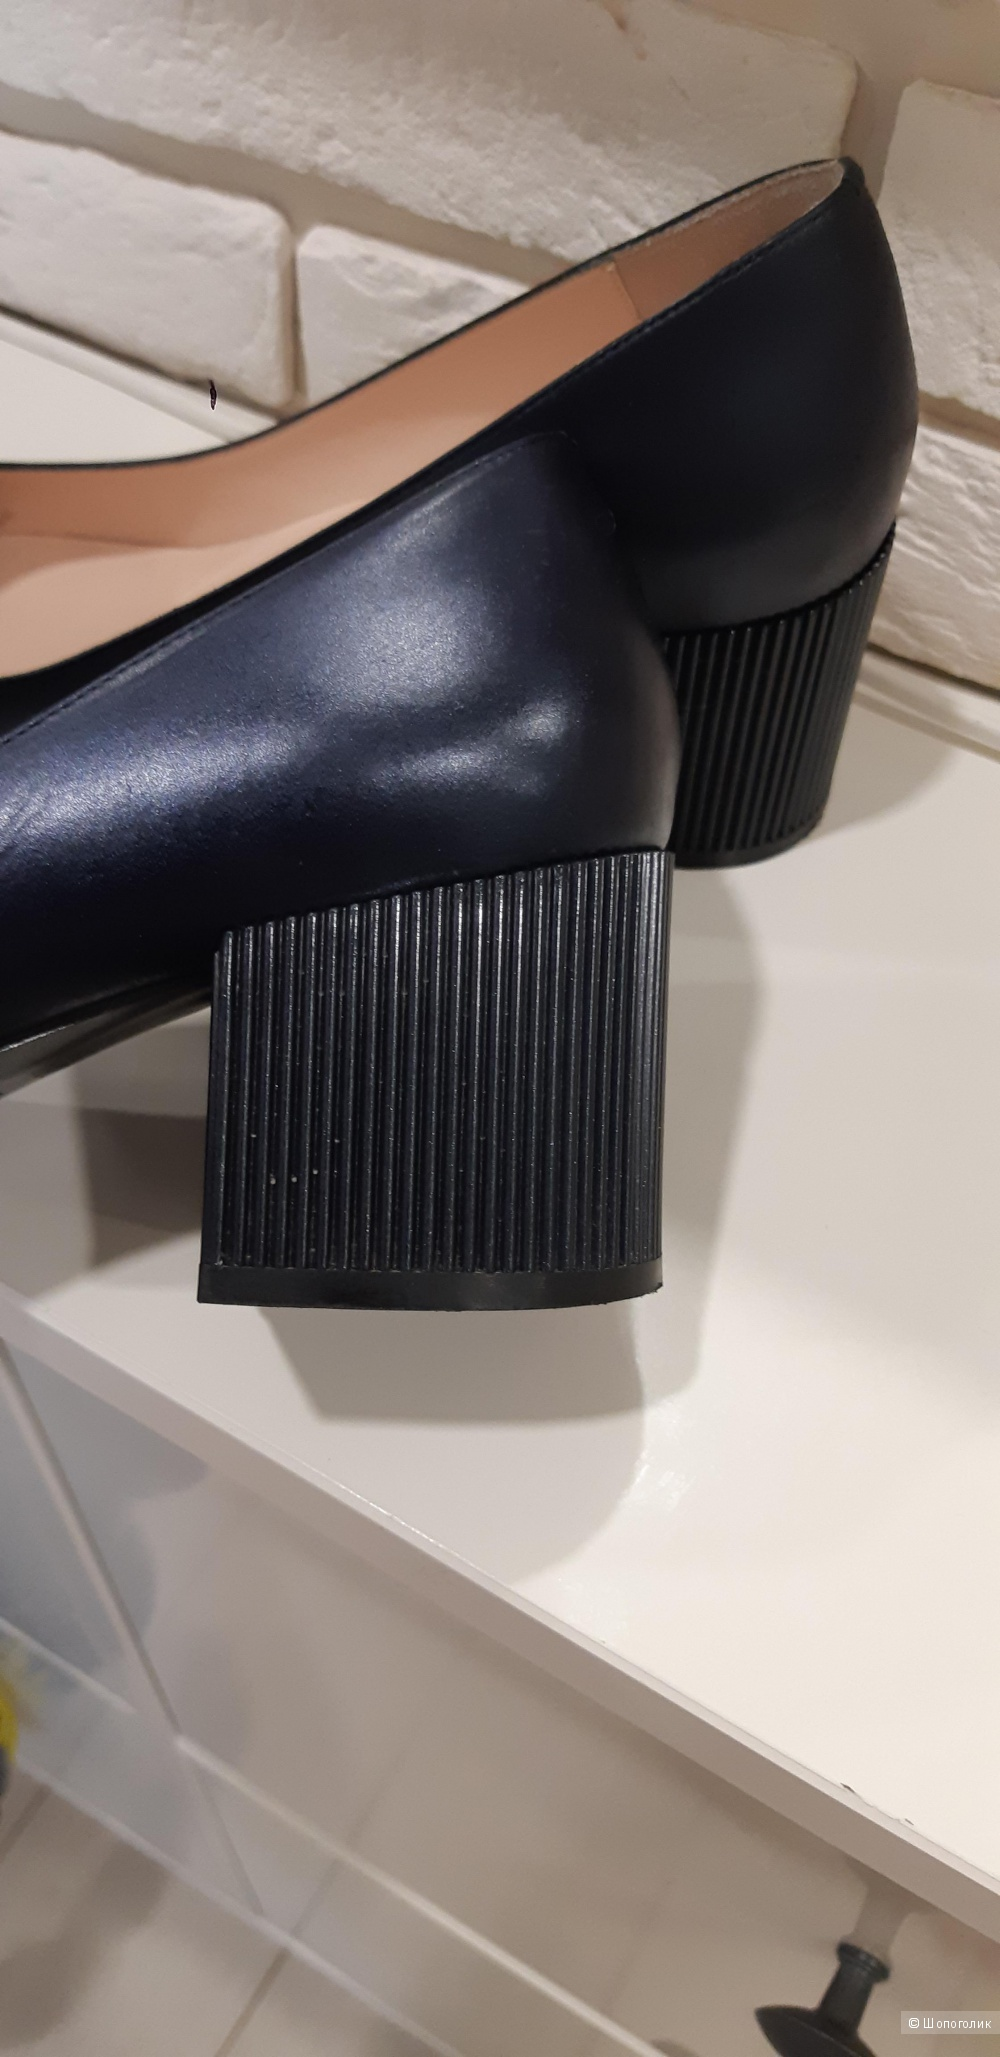 Кожаные туфли Carlo Pazolini, р. 38.5